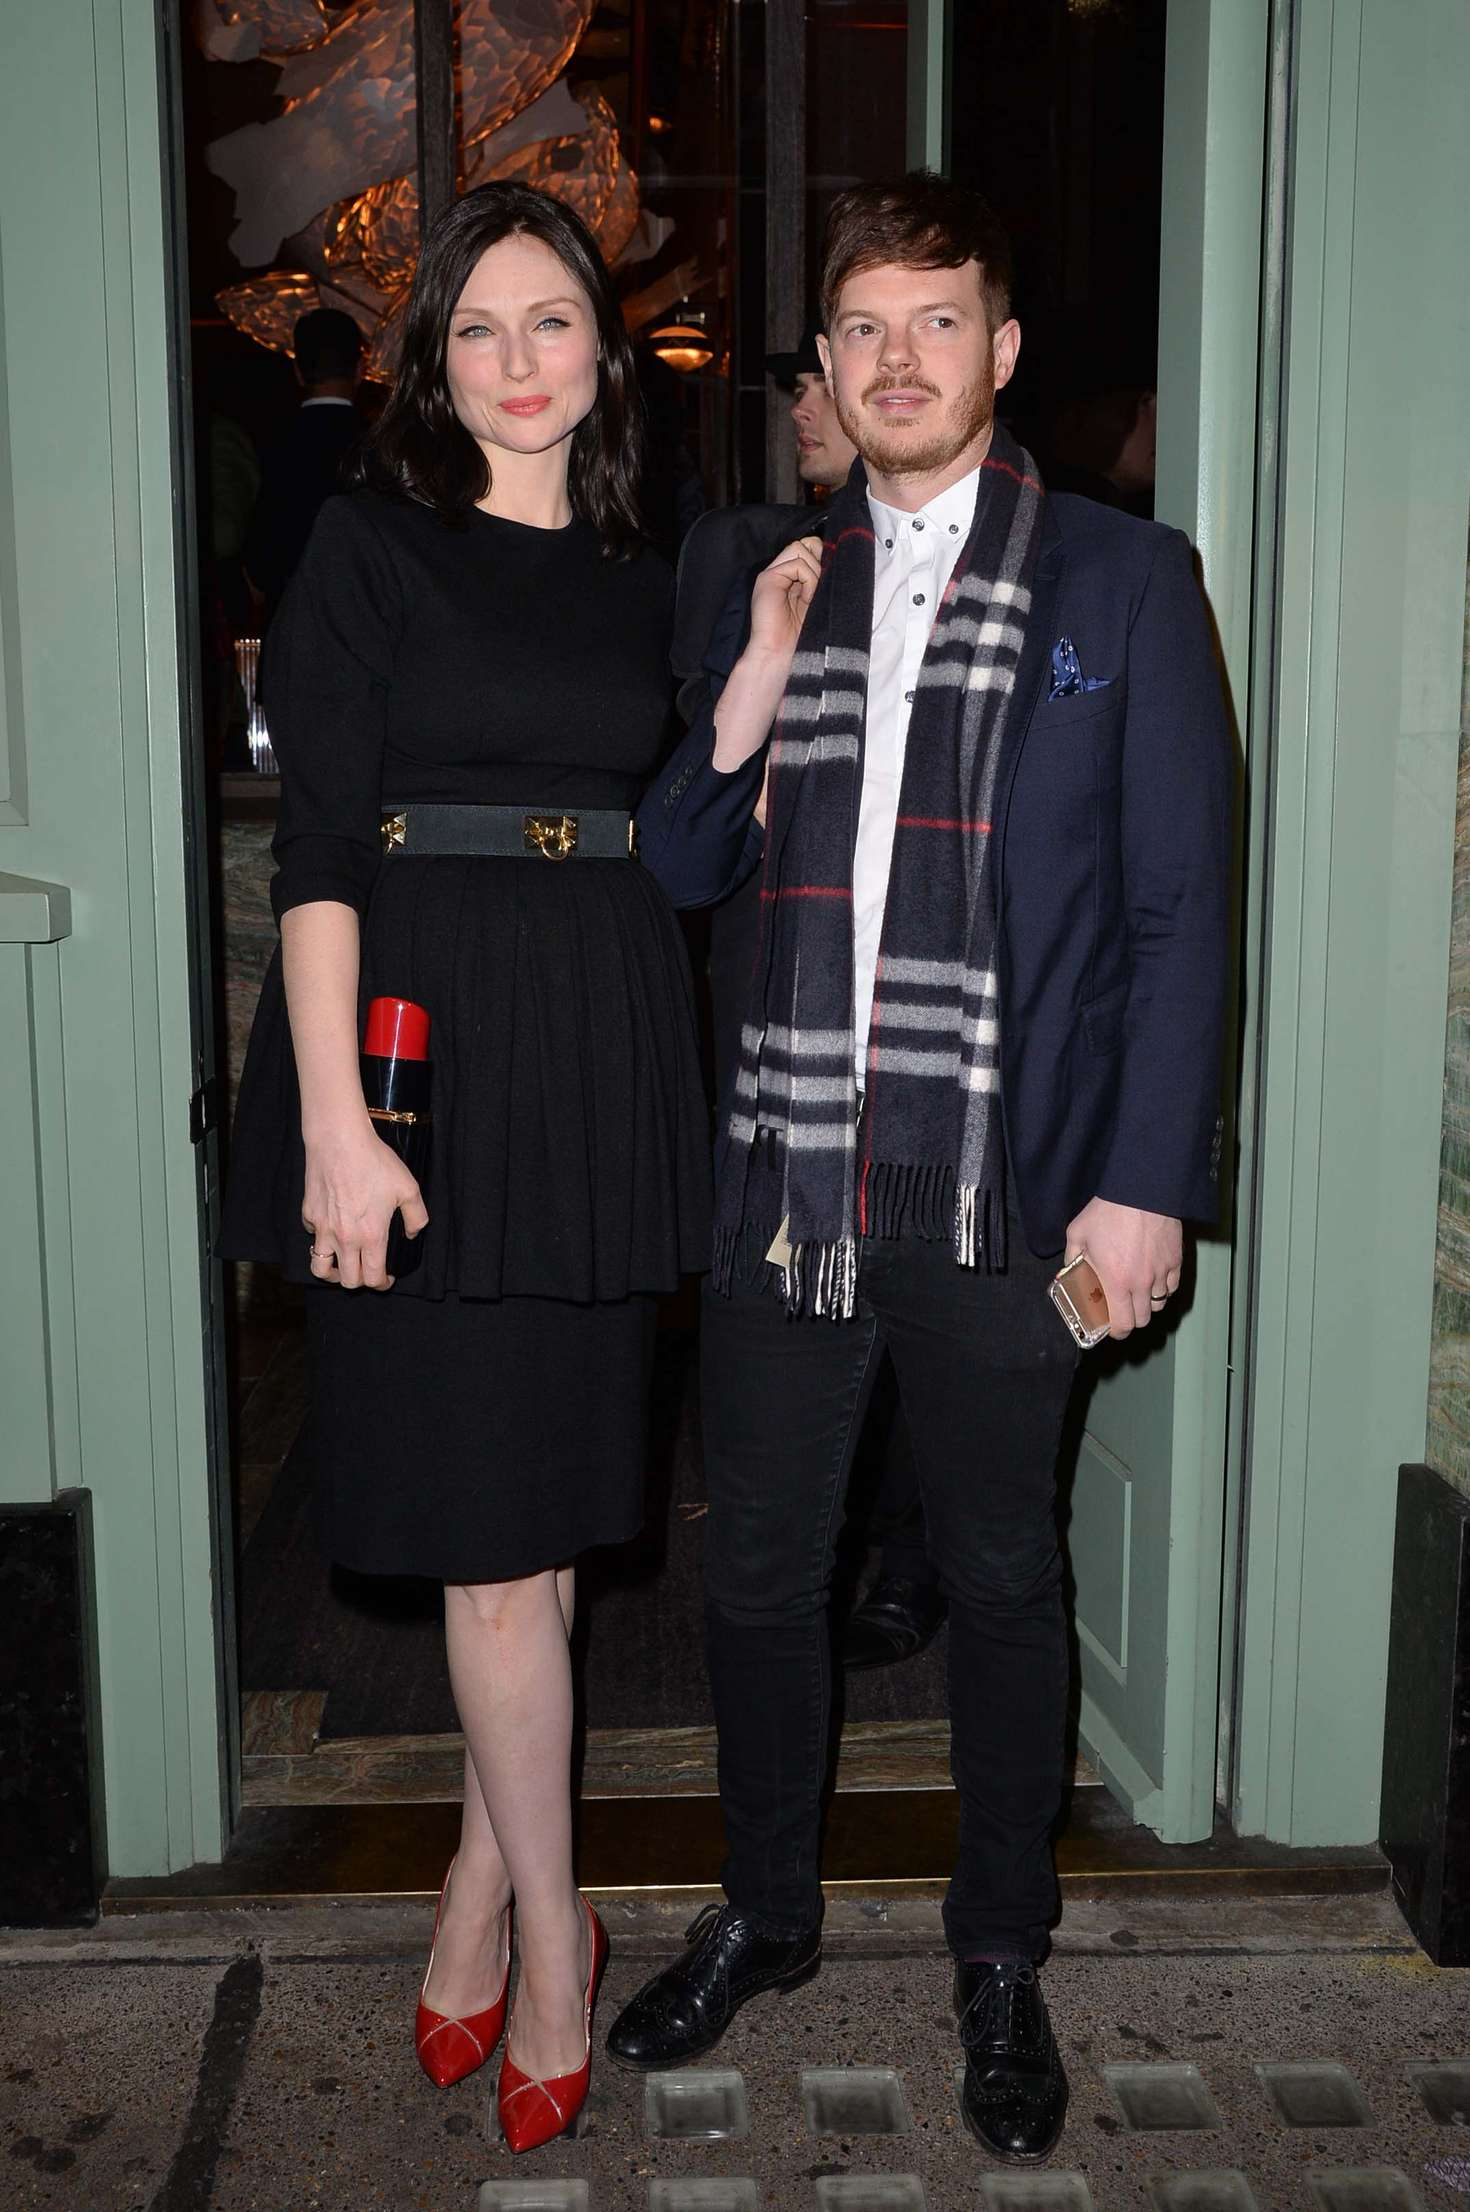 Sophie Ellis-Bextor at Private Dinner of Creme de la Mer in London